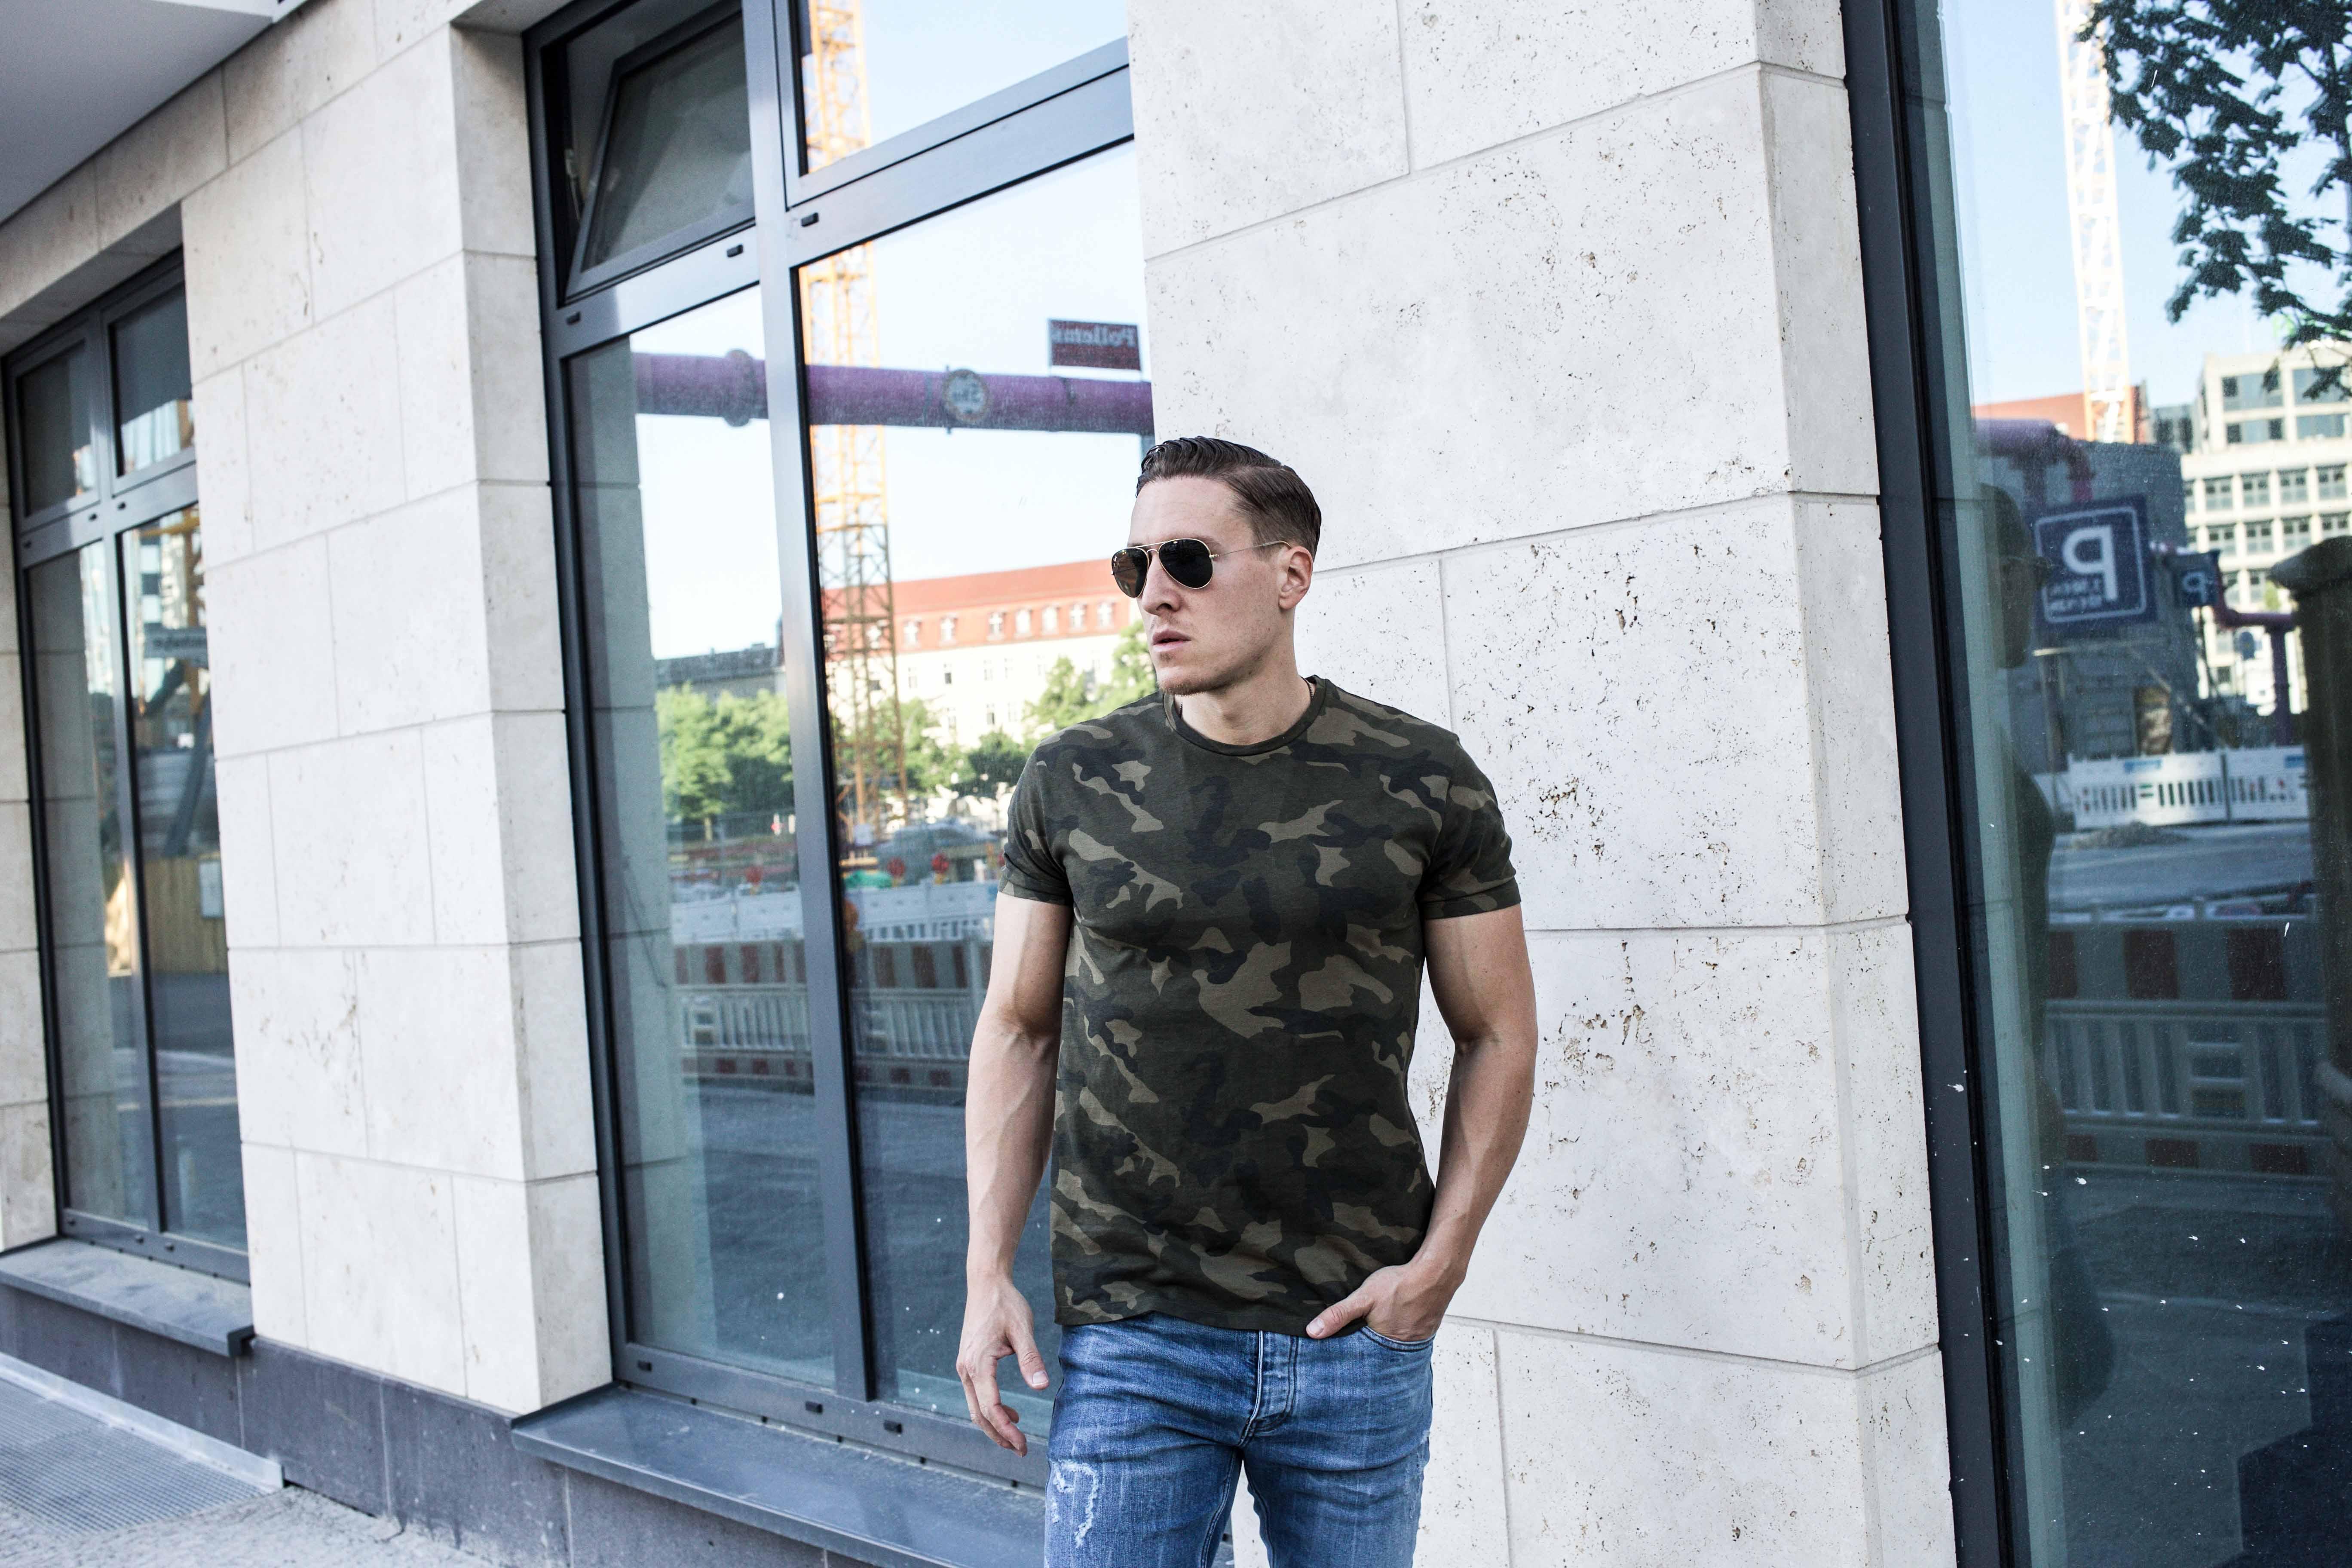 camouflage-braun-erdtöne-boots-ripped-jeans-männer-lifestyle-modeblog_6850